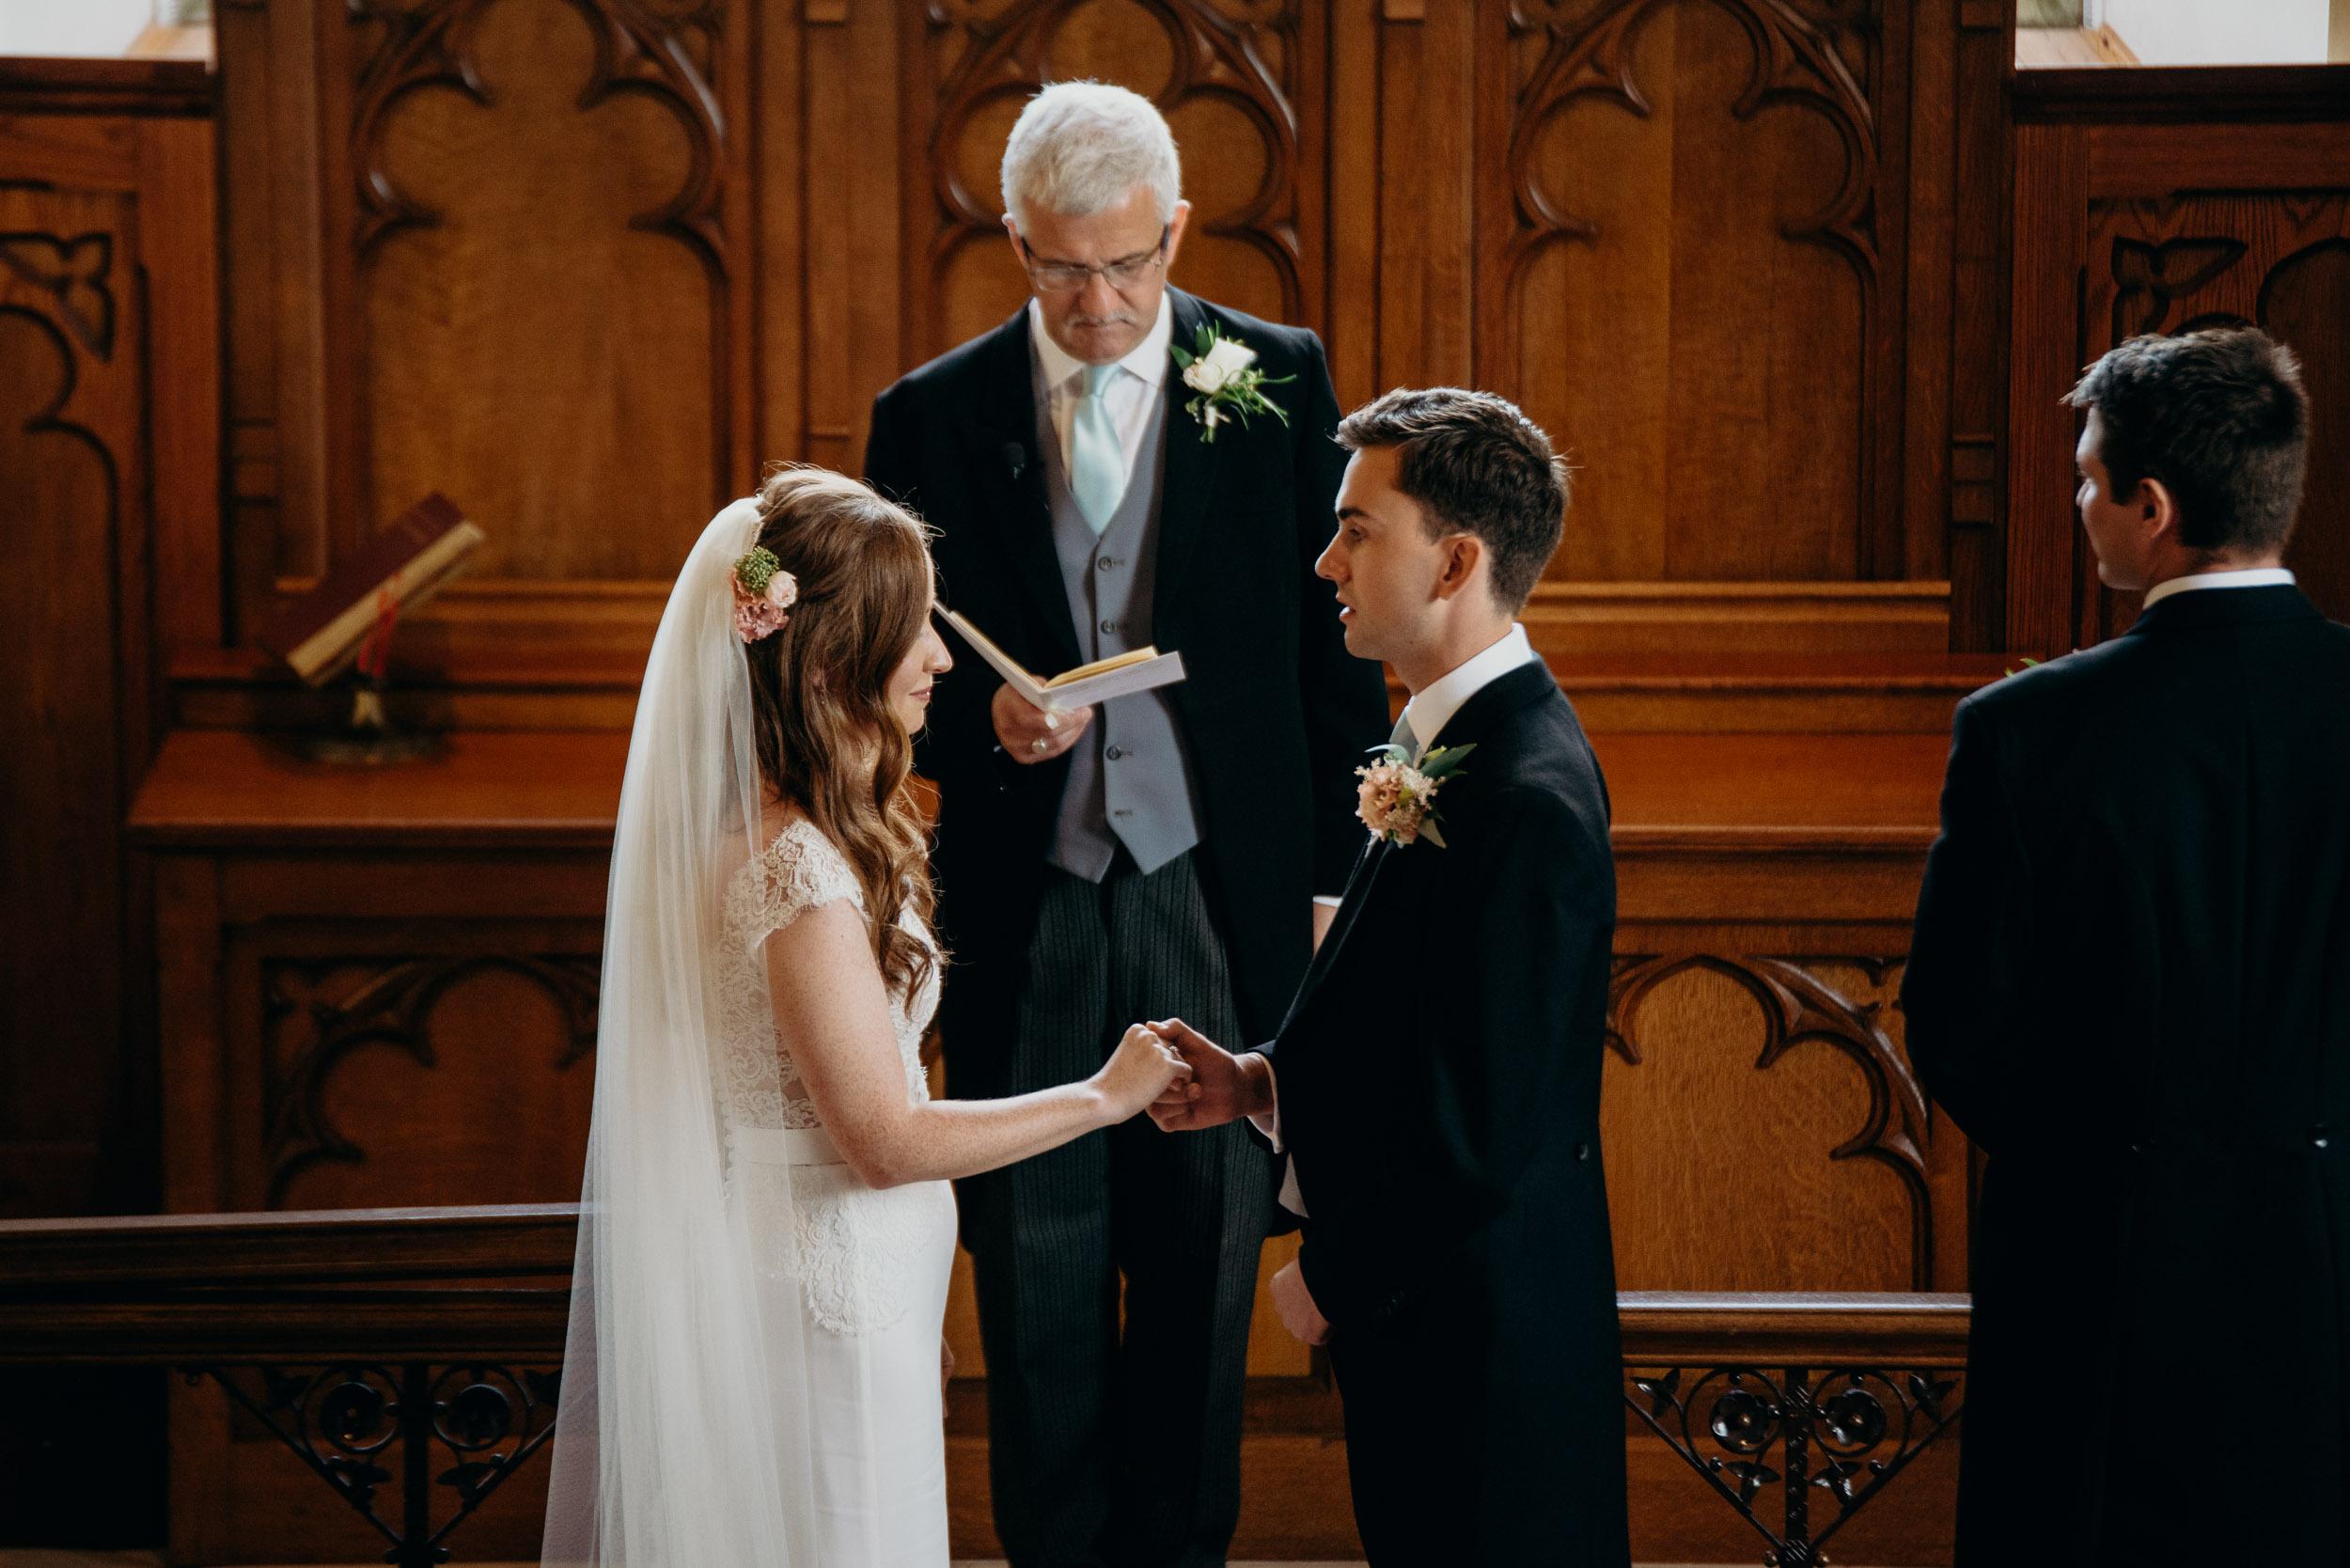 drenagh estate wedding photography-49.jpg